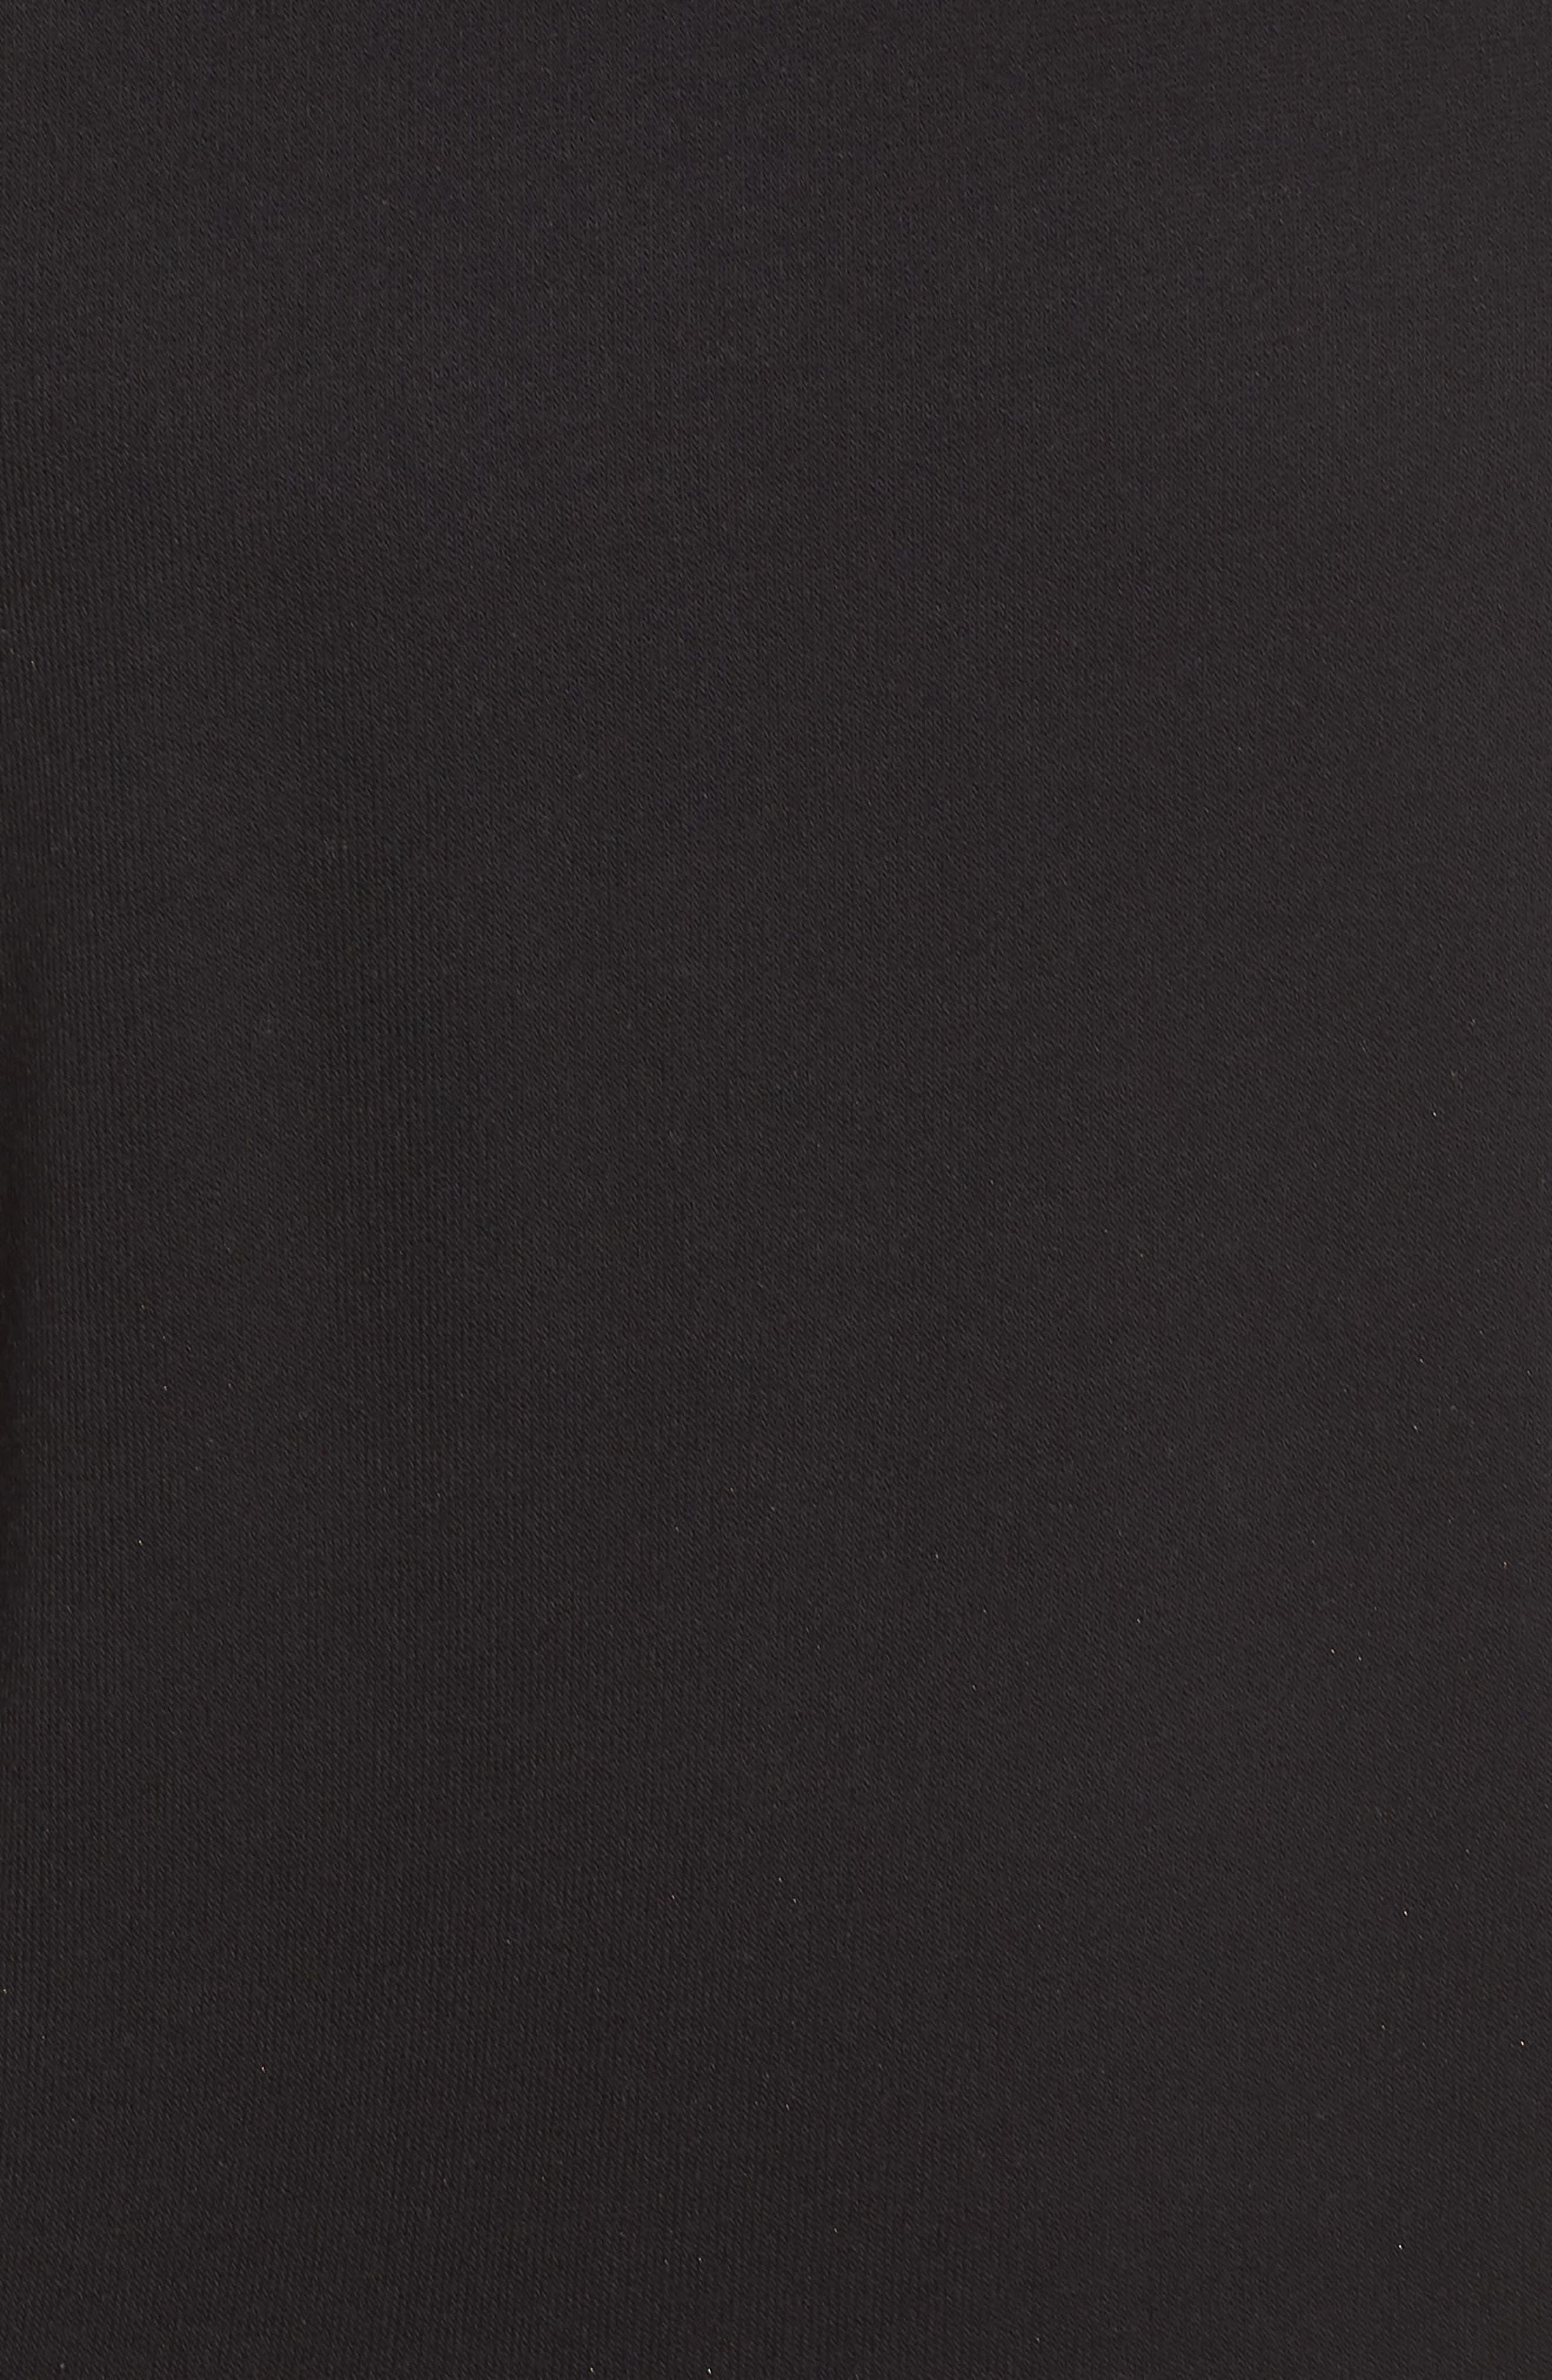 ALO, Clarity Long Sleeve Sweatshirt, Alternate thumbnail 6, color, BLACK